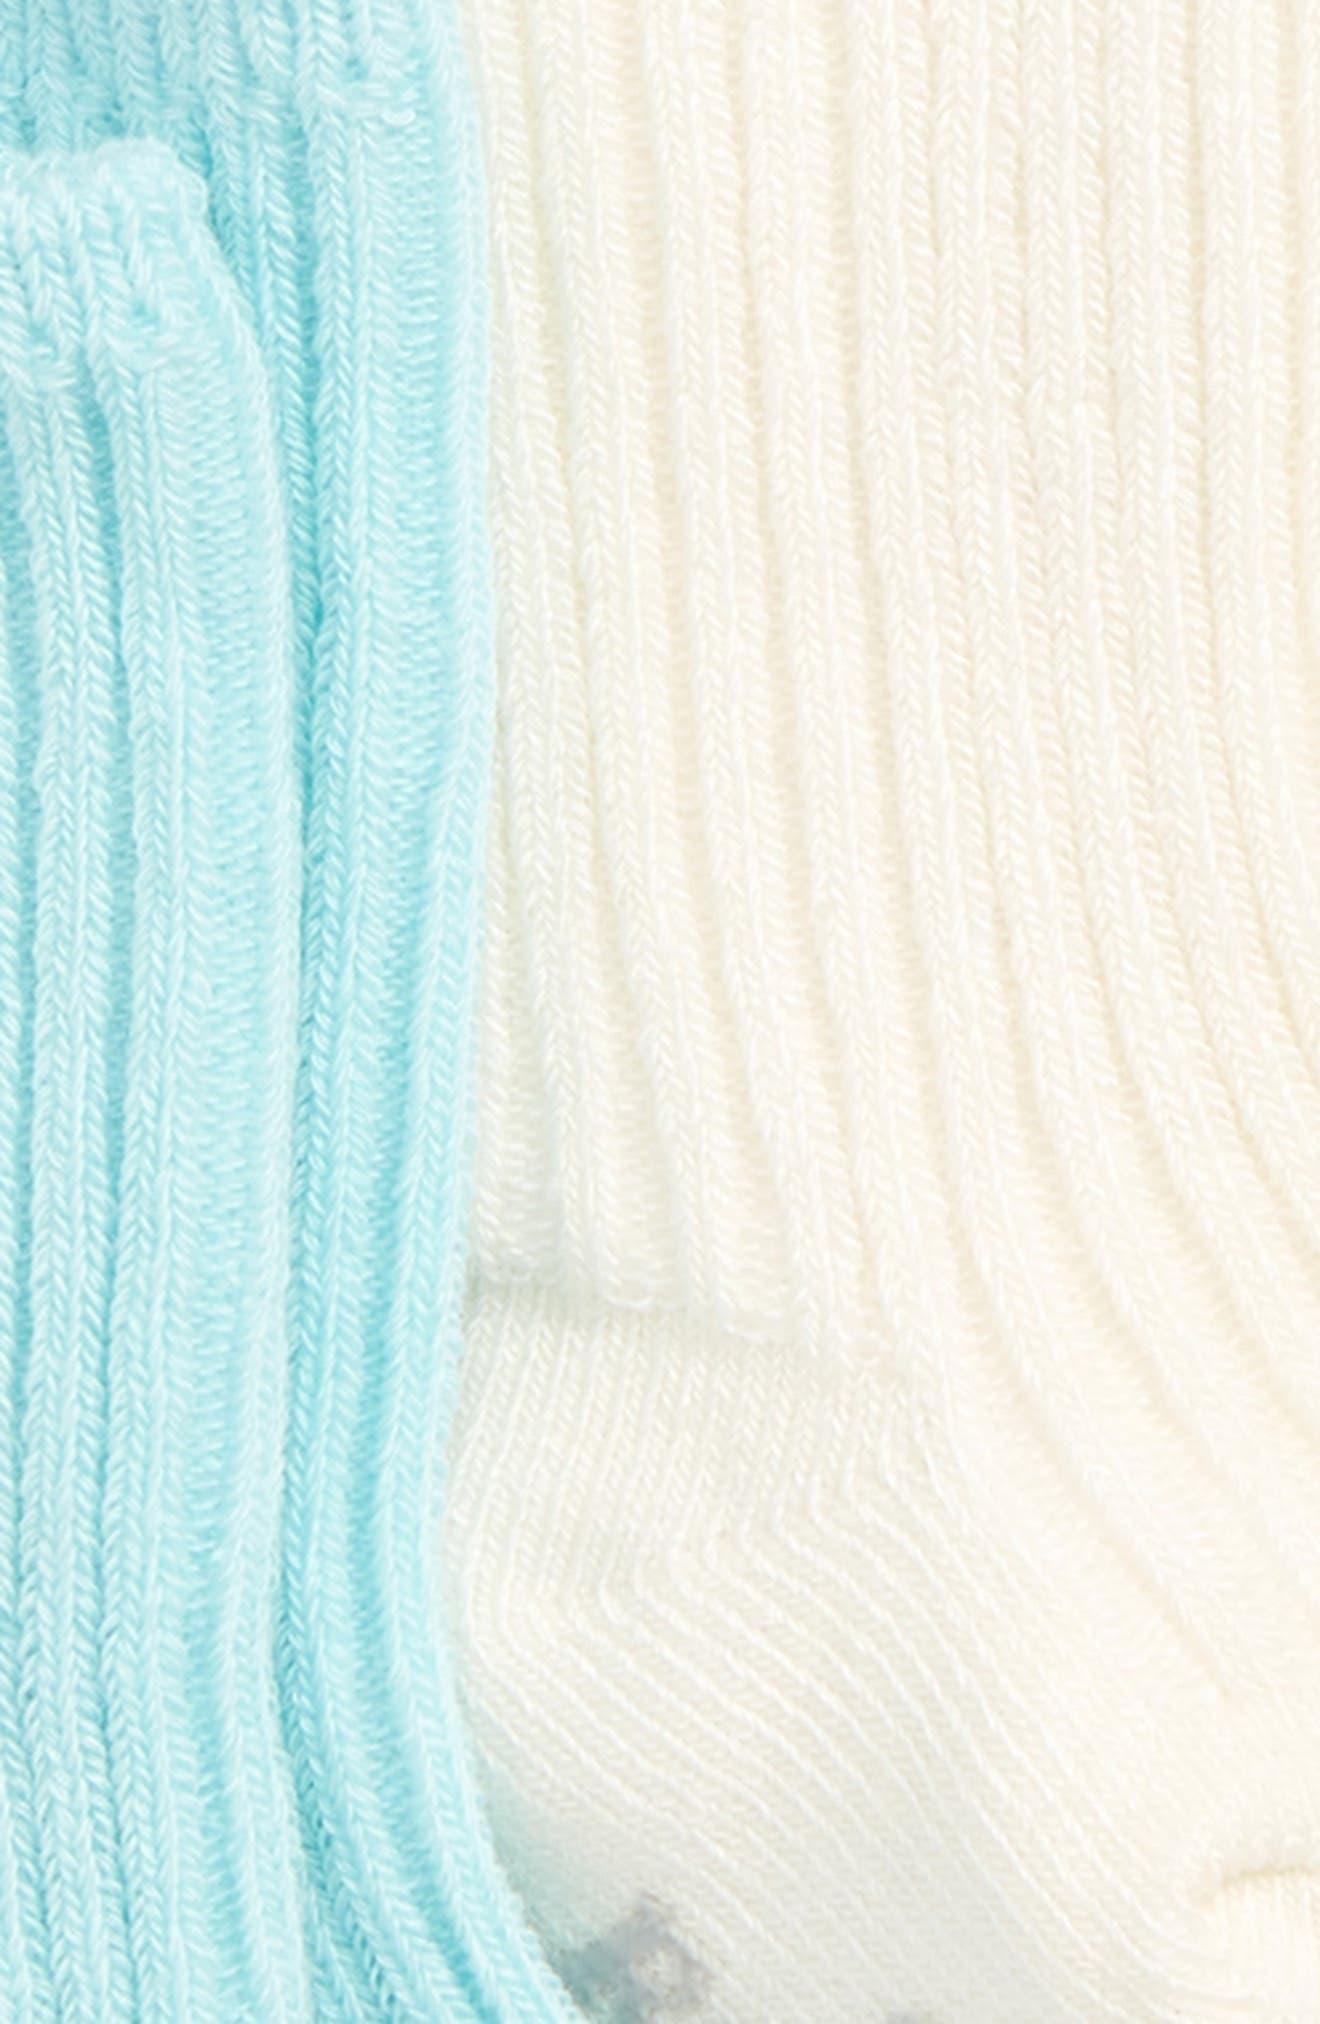 3-Pack Tabitha Basic Socks,                             Alternate thumbnail 2, color,                             CREAM/ AQUA/ GREY